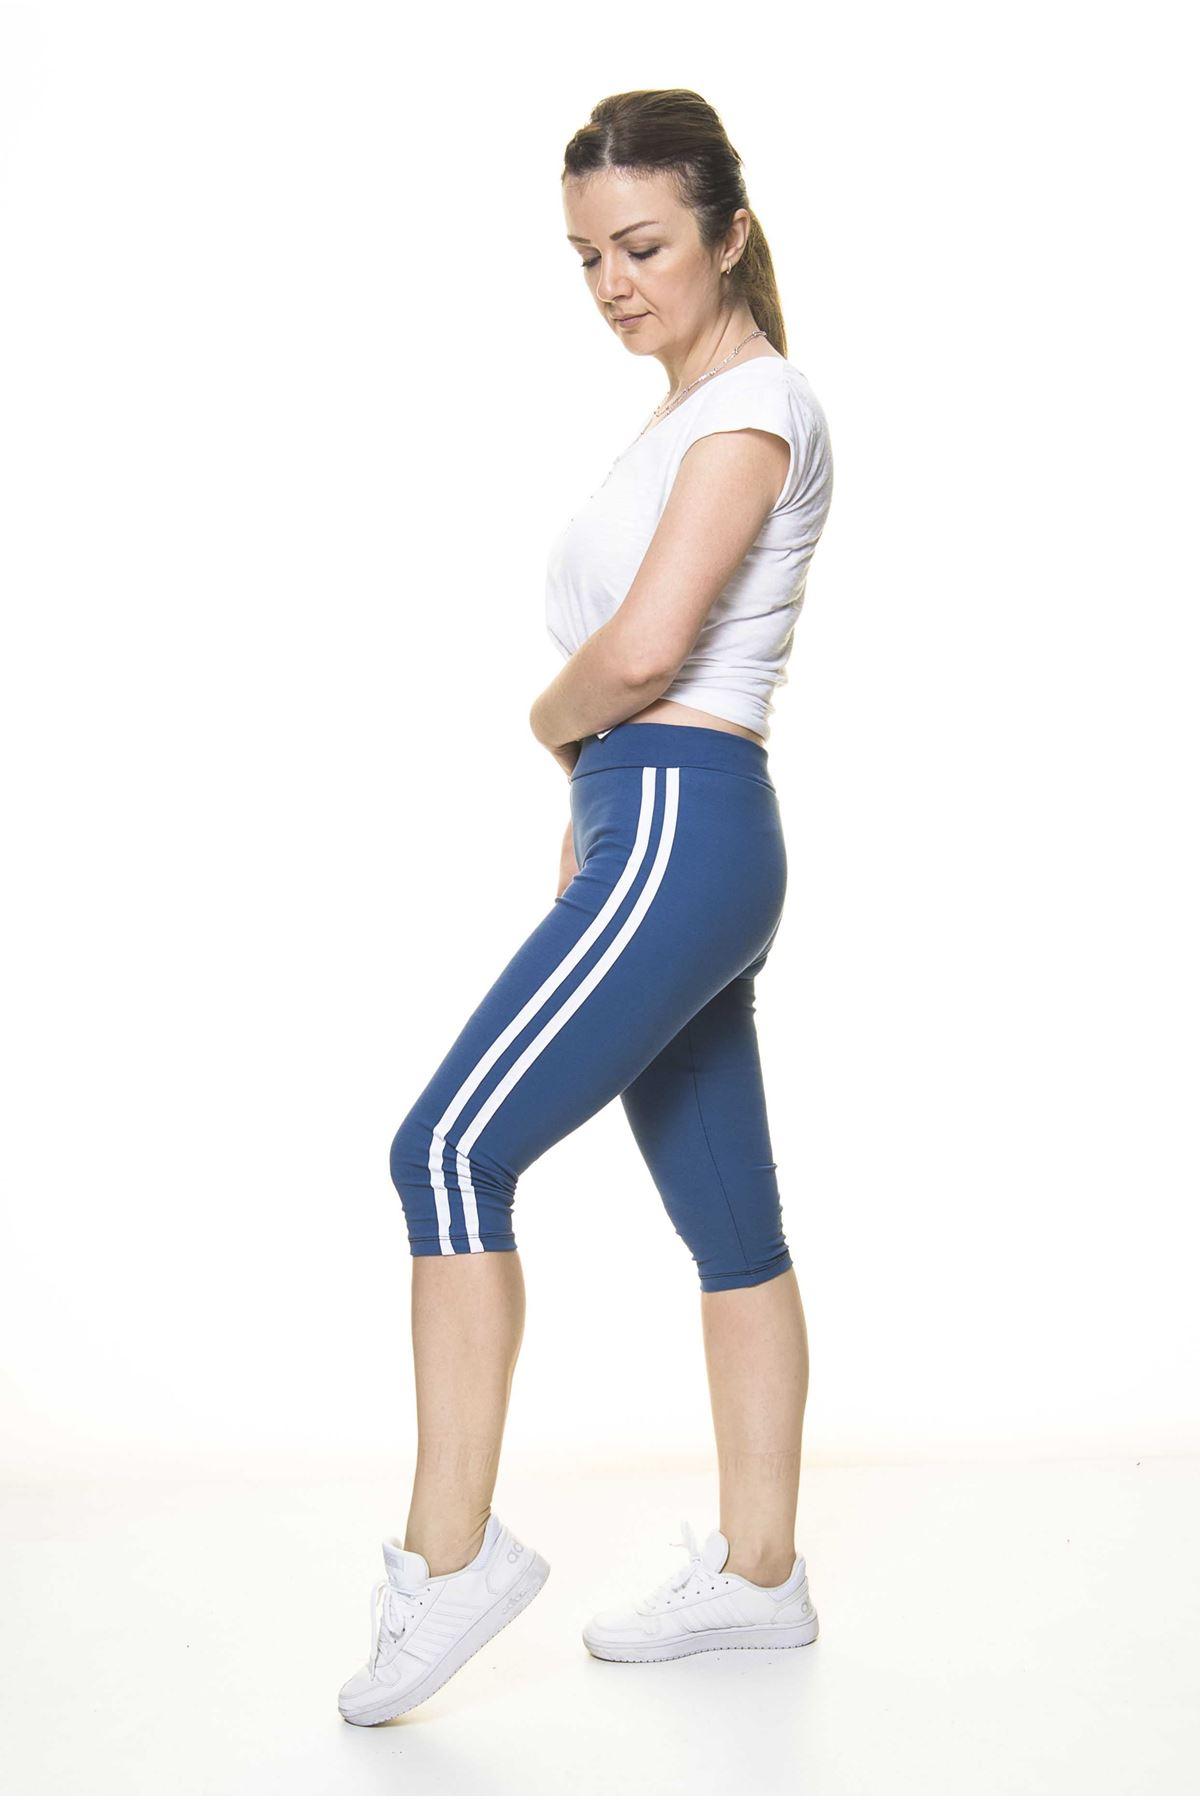 Kadın Spor Çizgili Mavi Kapri Tayt 11C-4011